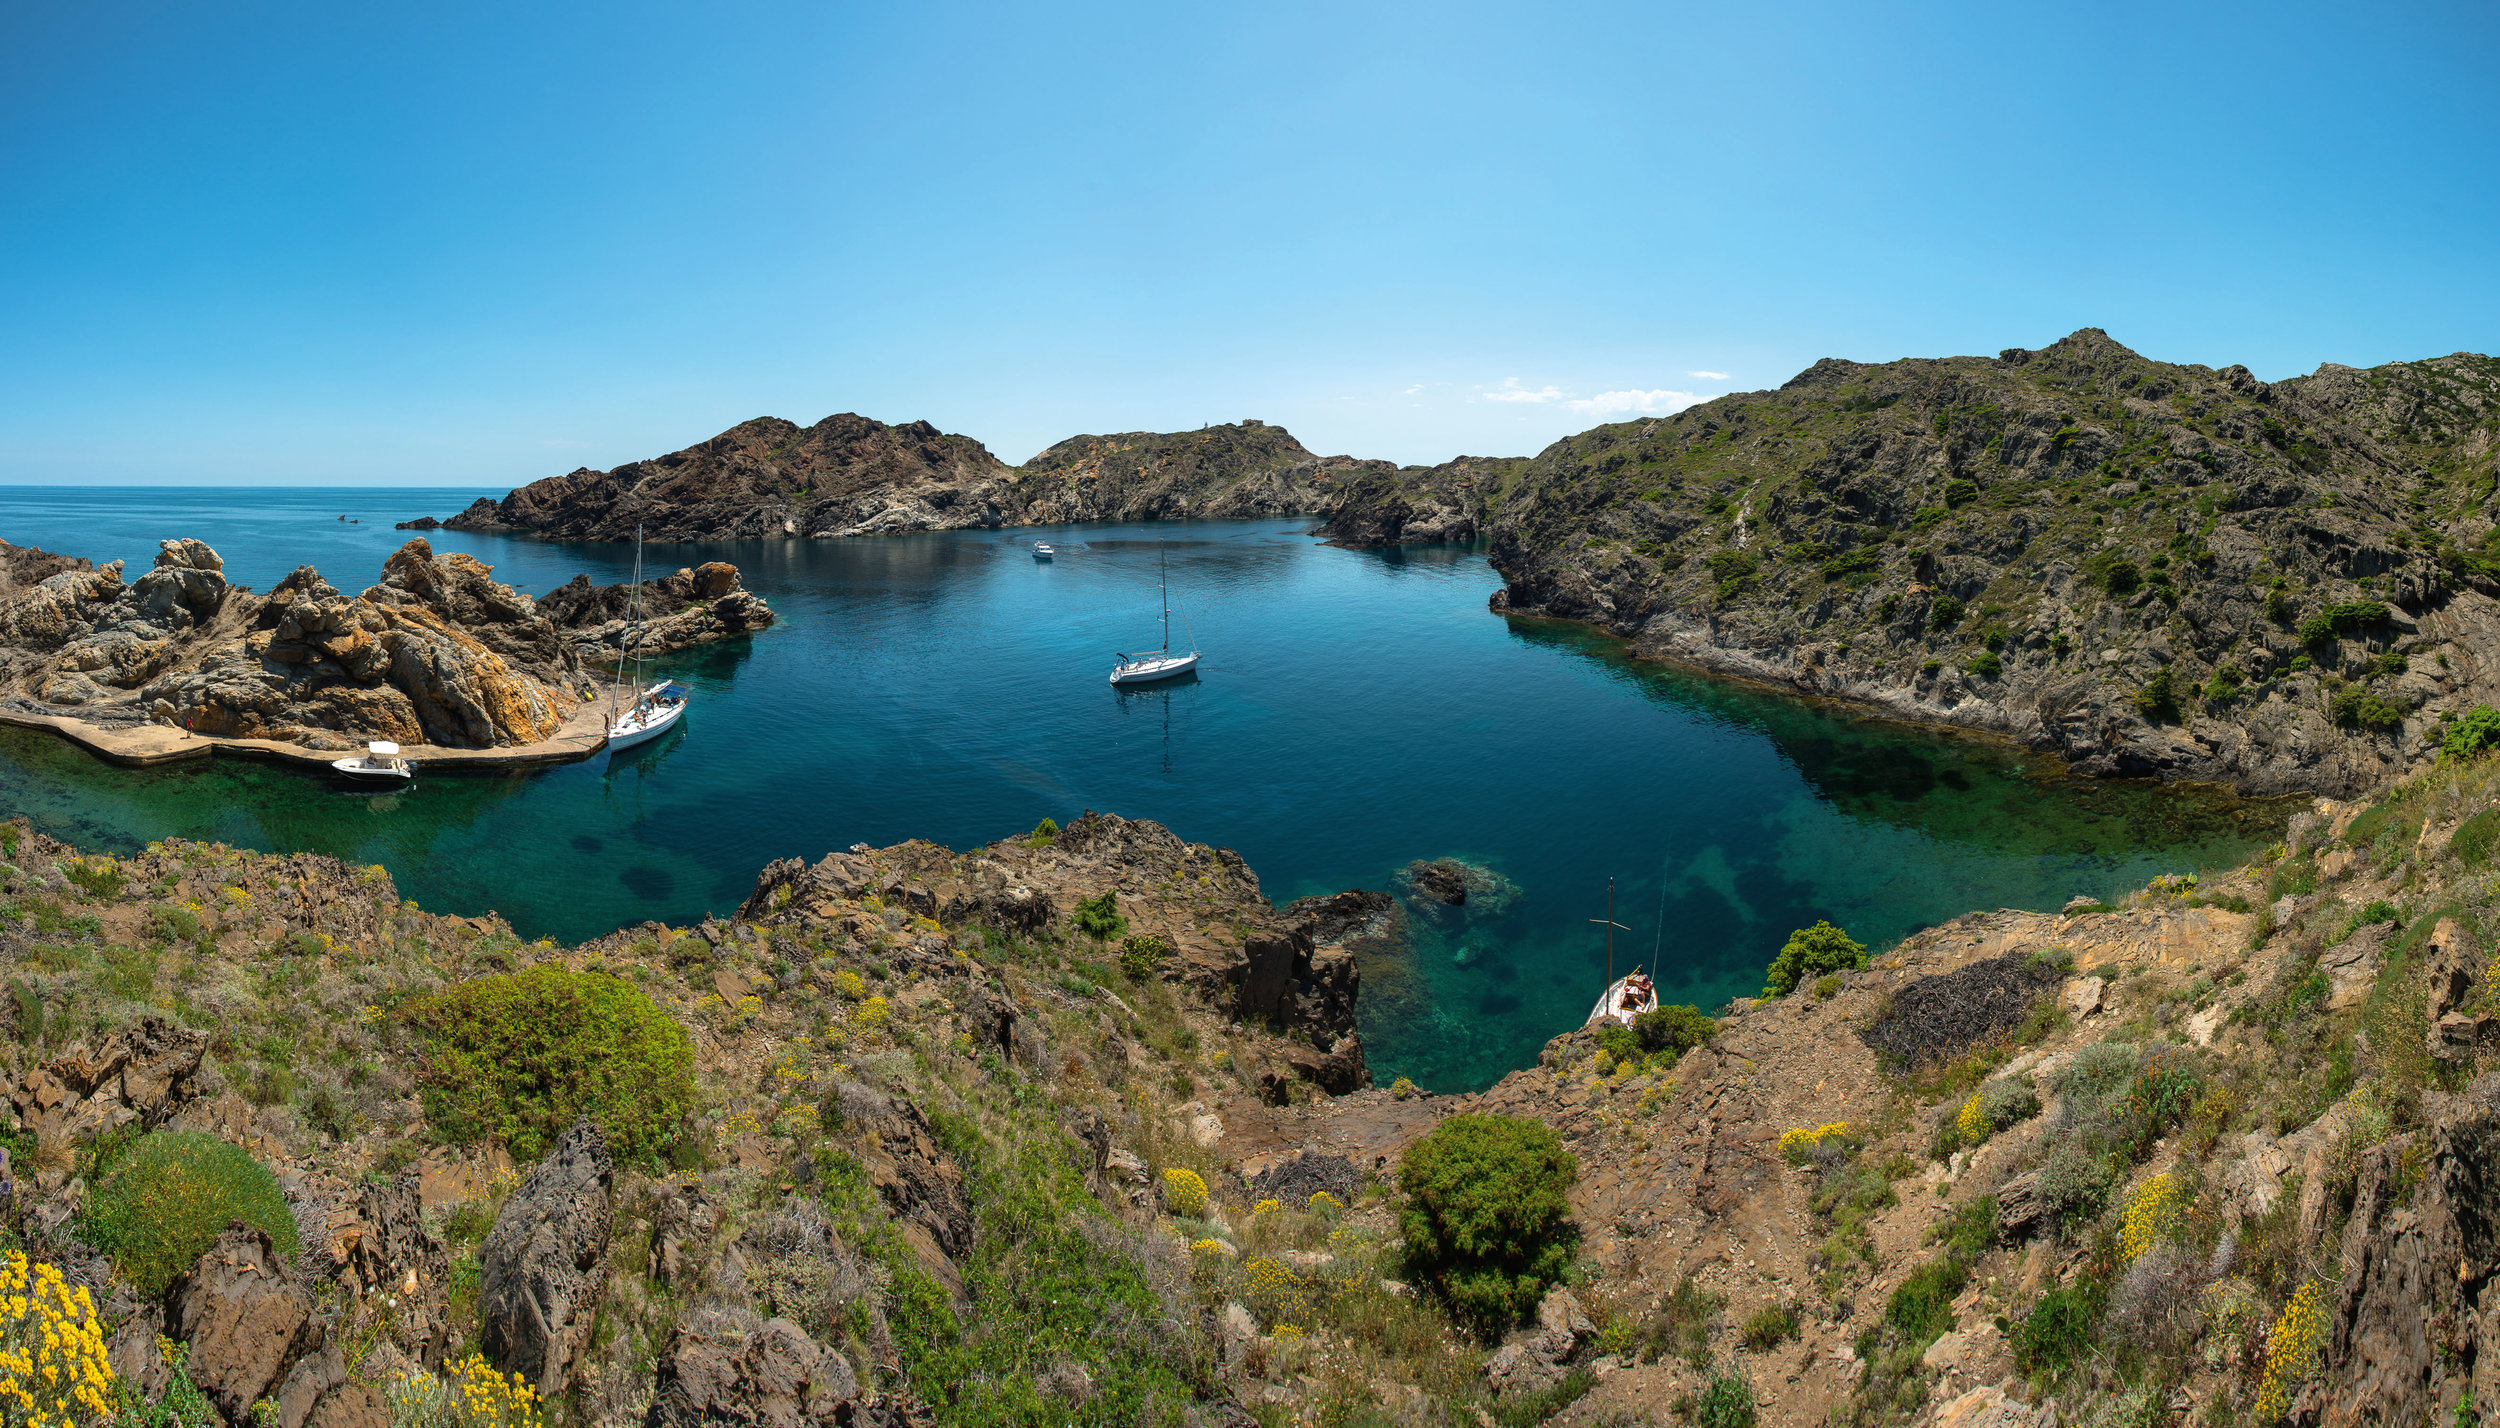 Parque Natural Cap de Creus. © J. M. Guasch. Archivo Imágenes PTCBG.